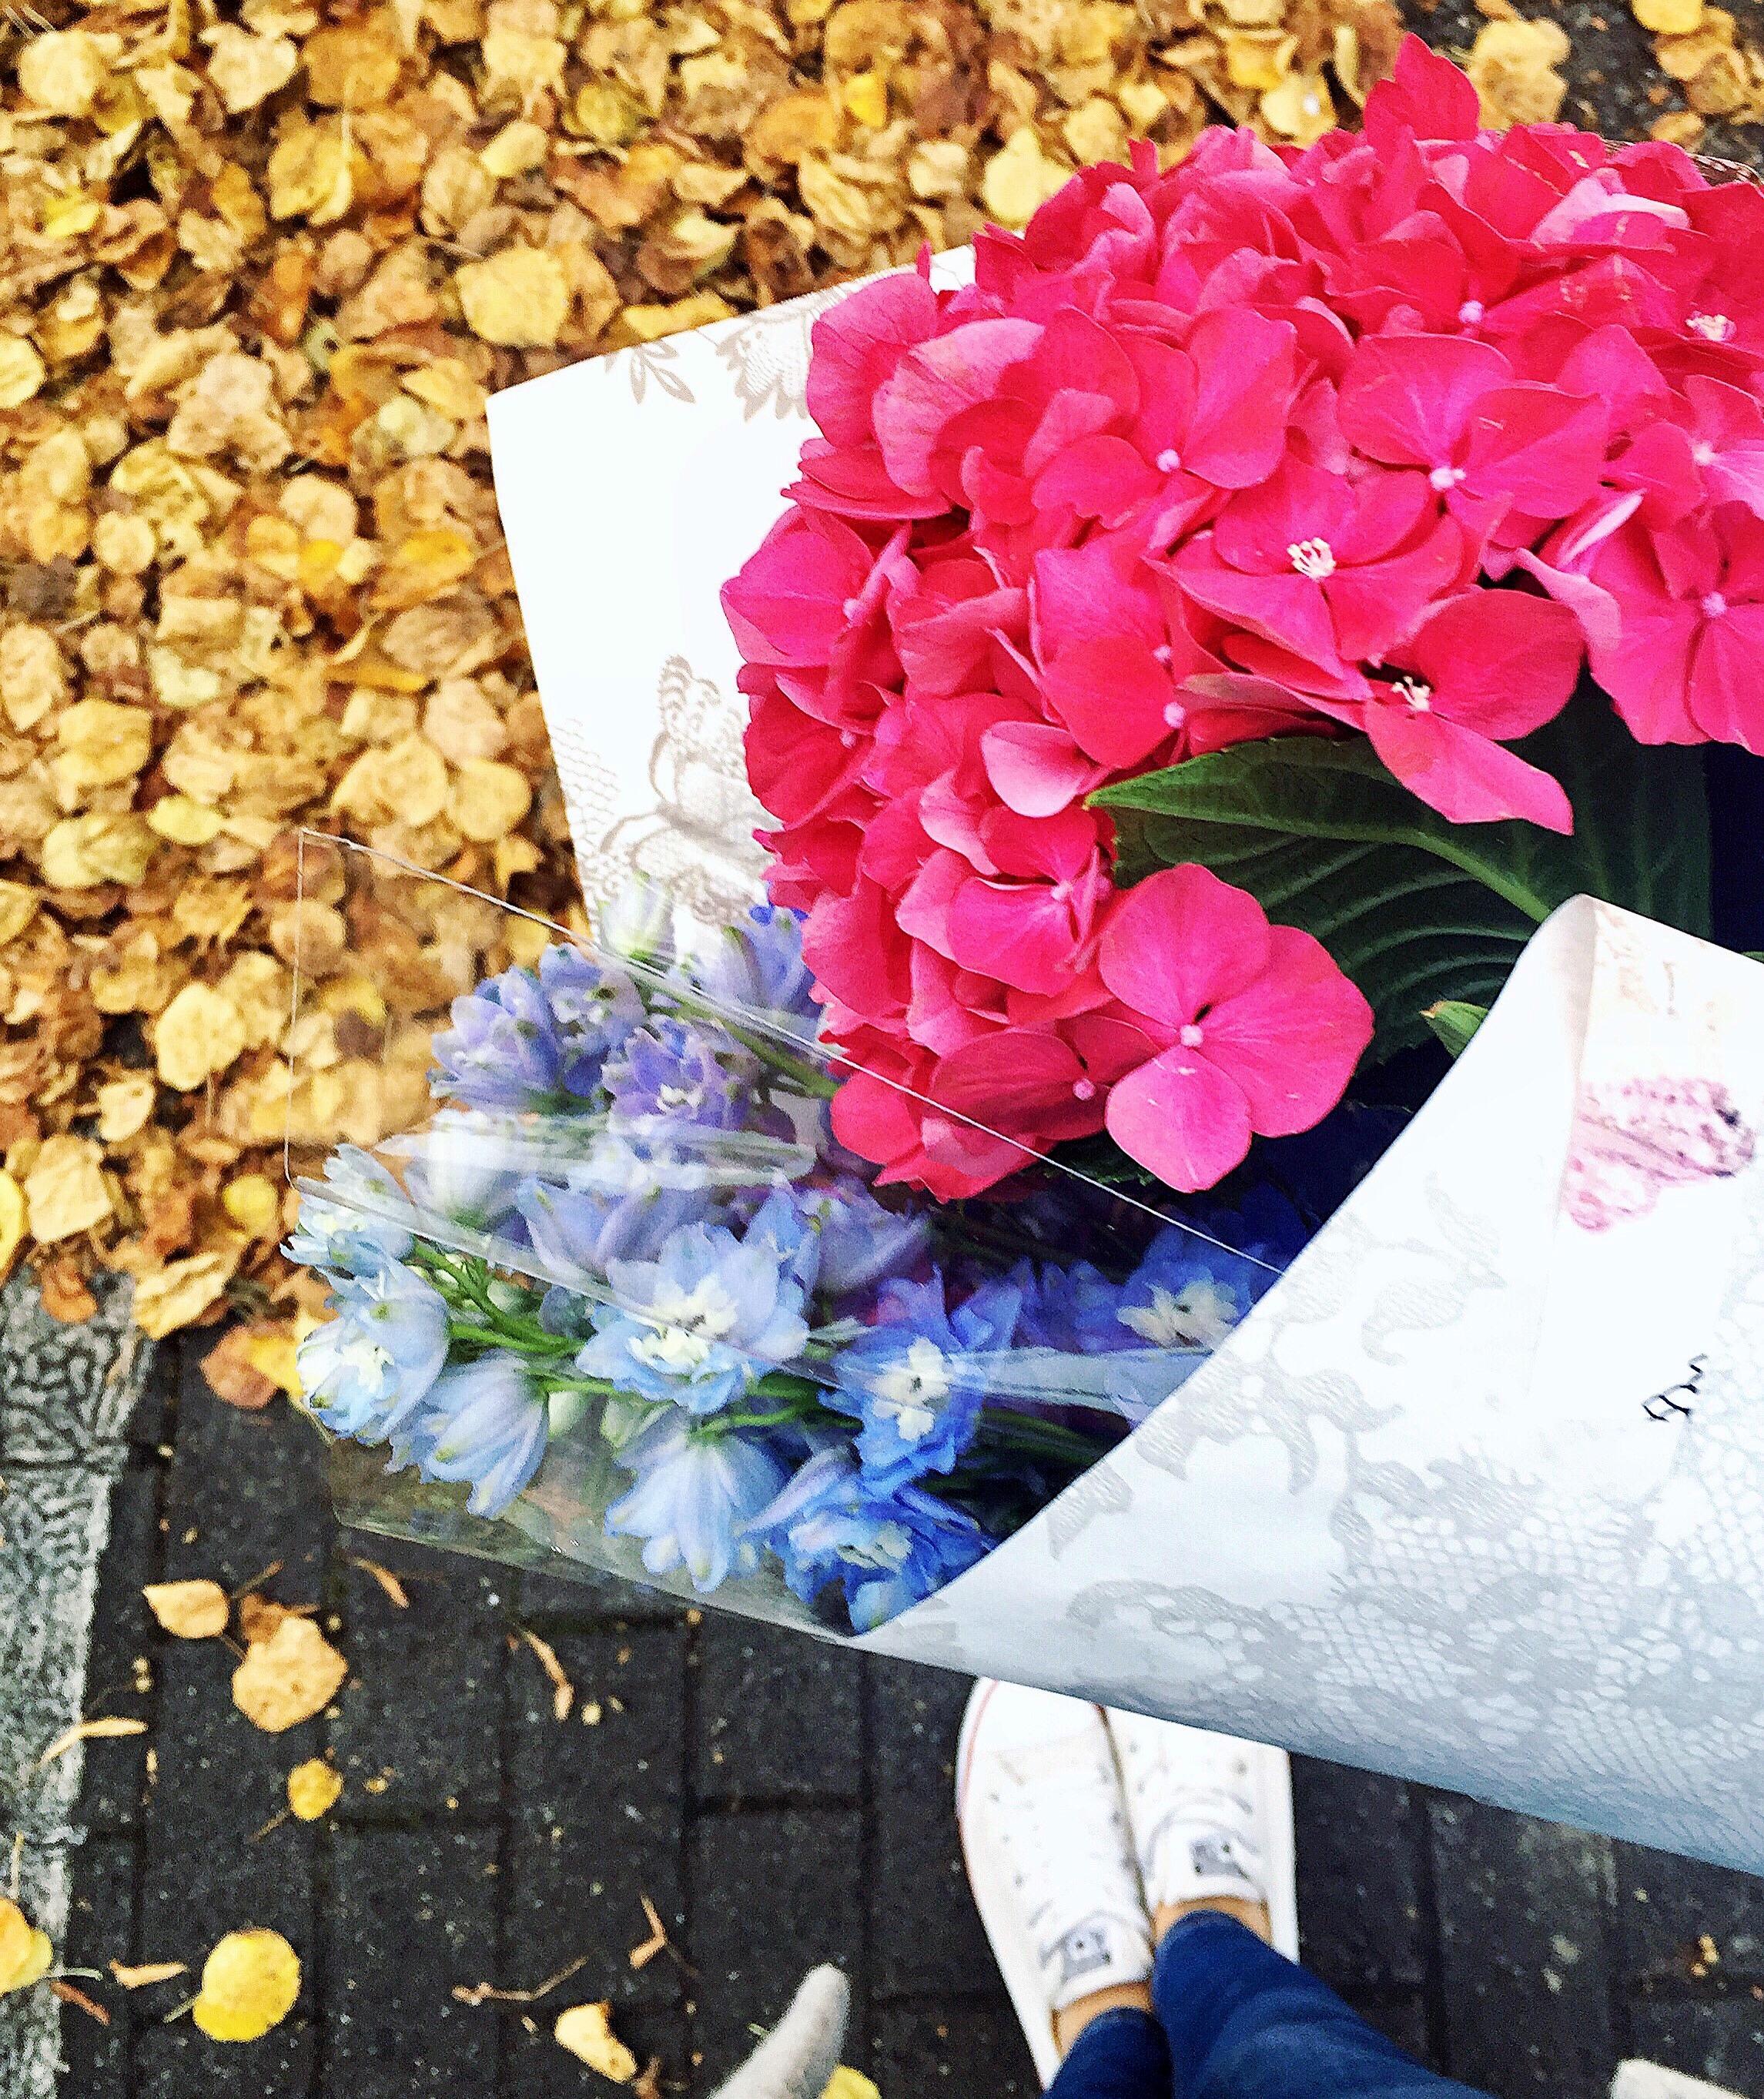 the-flower-man-local-flora-delphinium-hm-home-blog-autumn.JPG